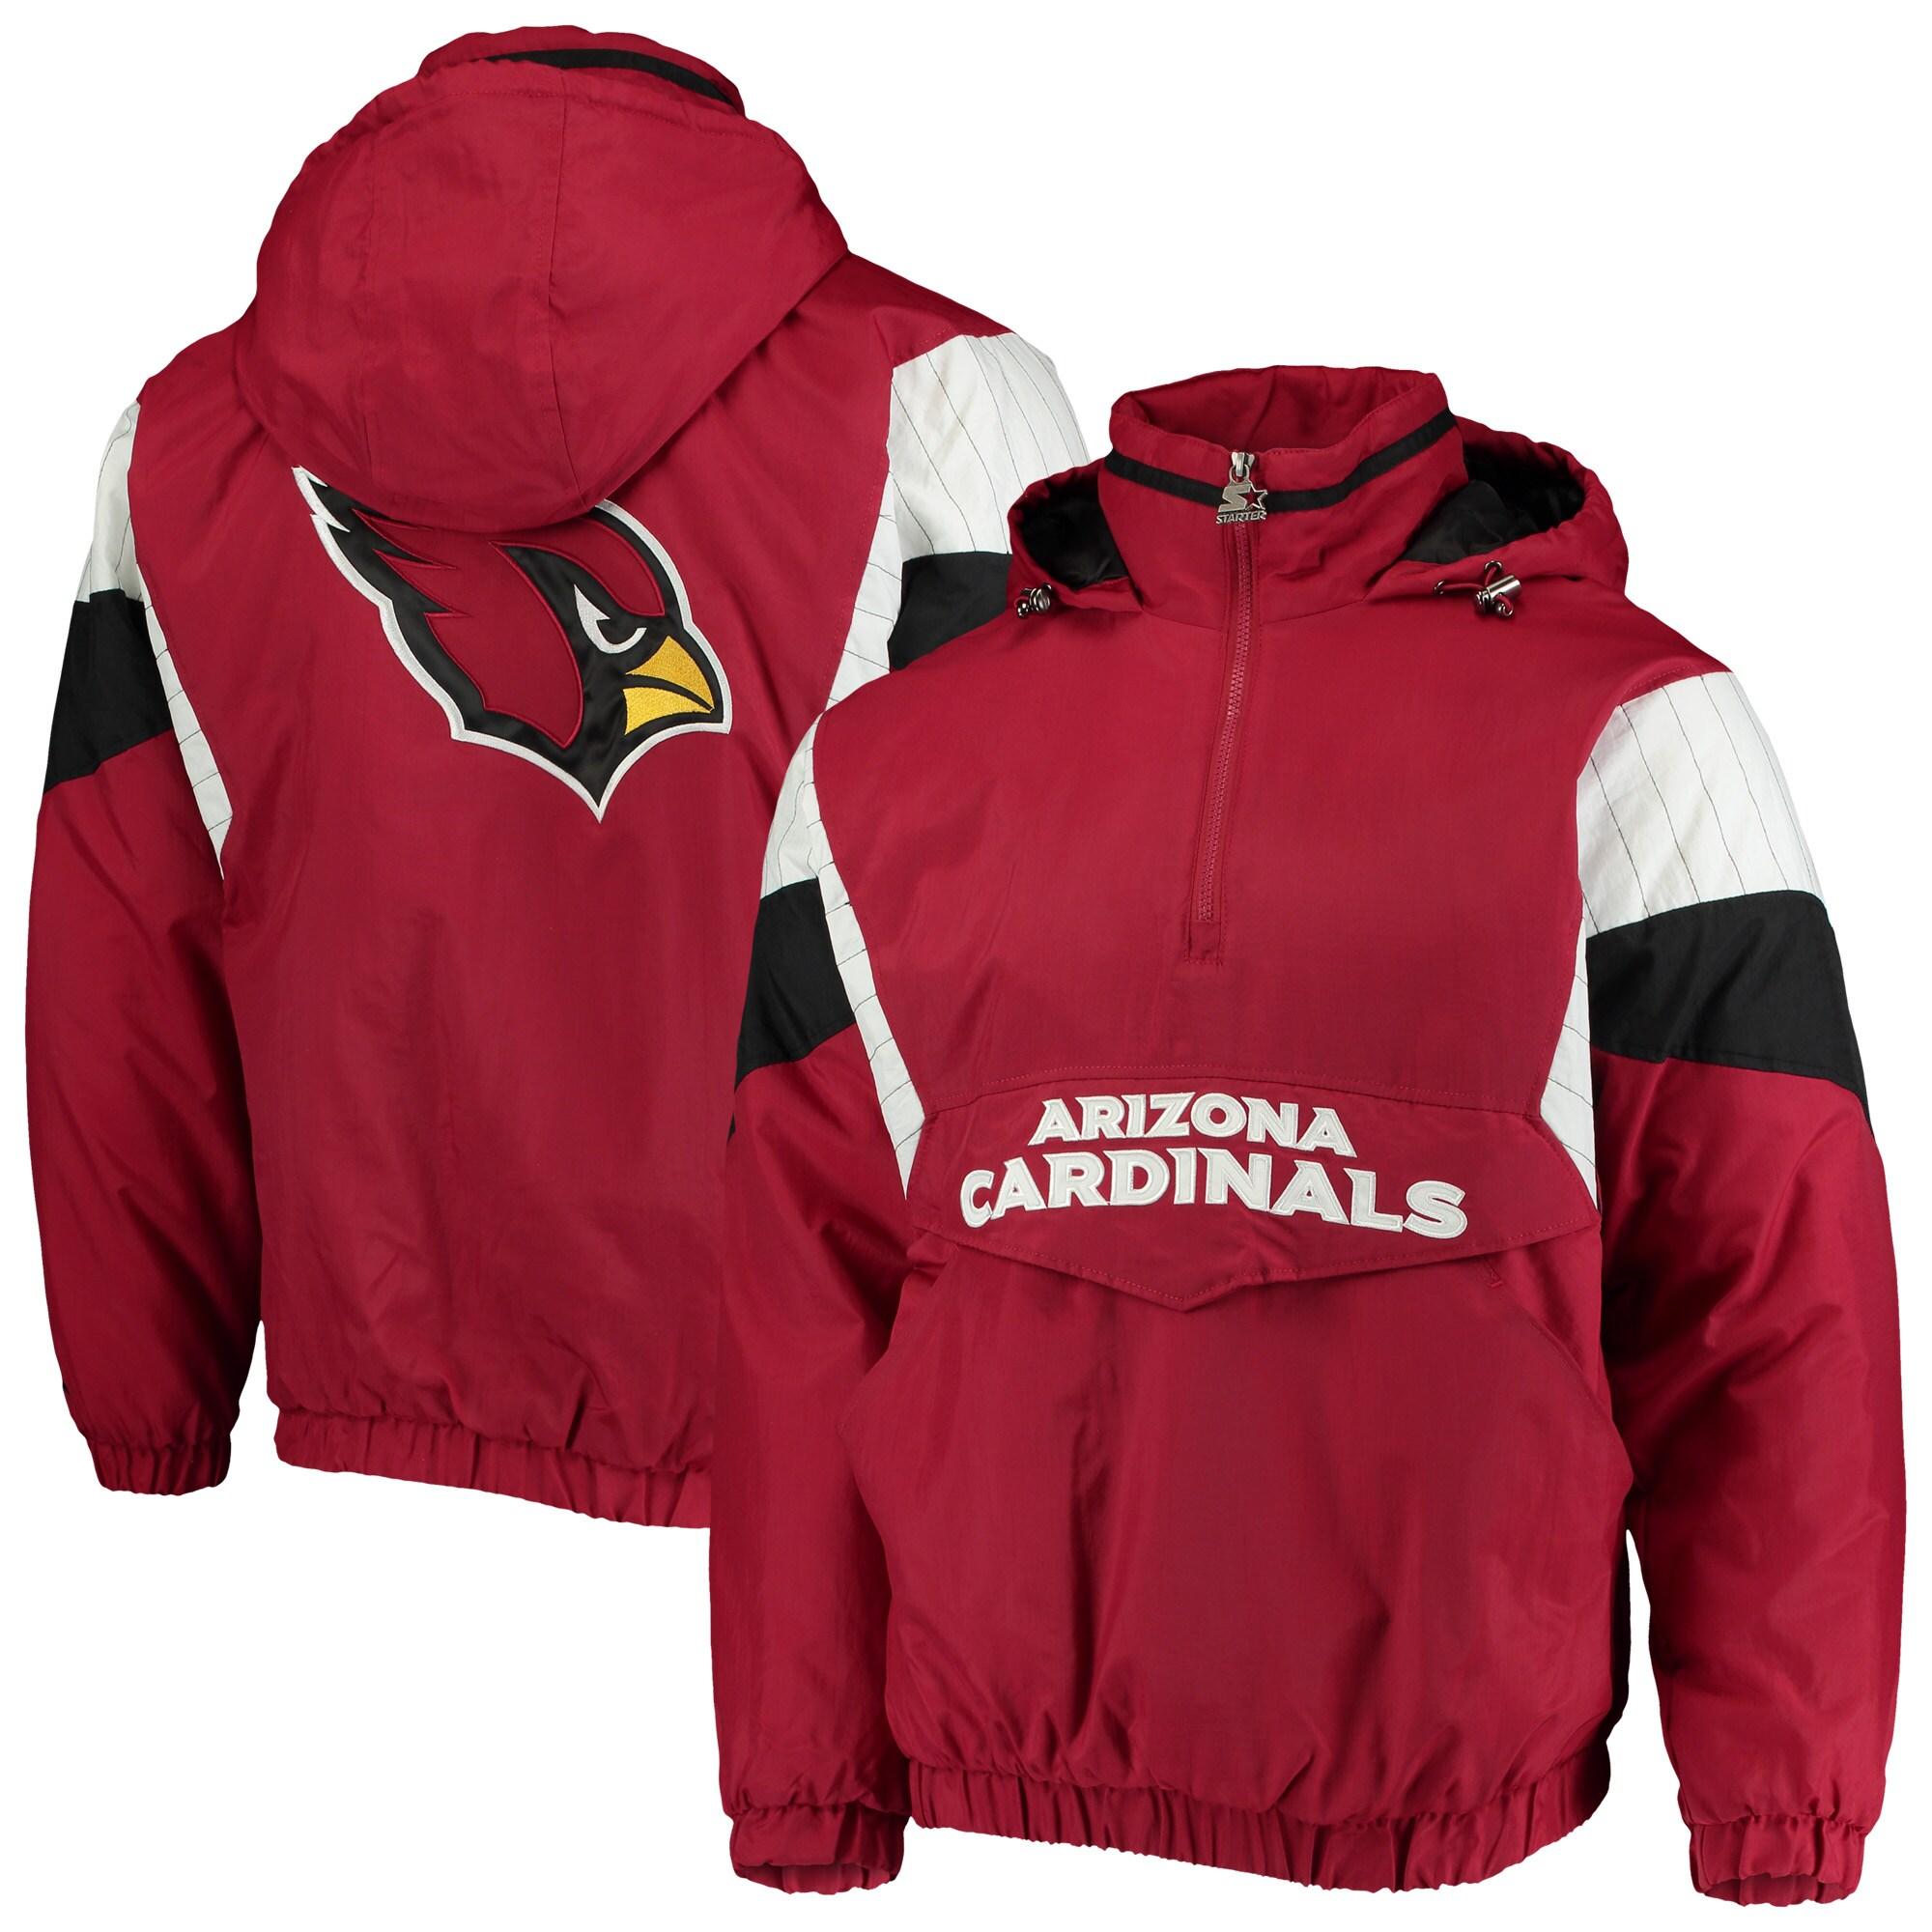 Arizona Cardinals Starter NFL 100 Thursday Night Lights Quarter-Zip Breakaway Jacket - Cardinal/Black